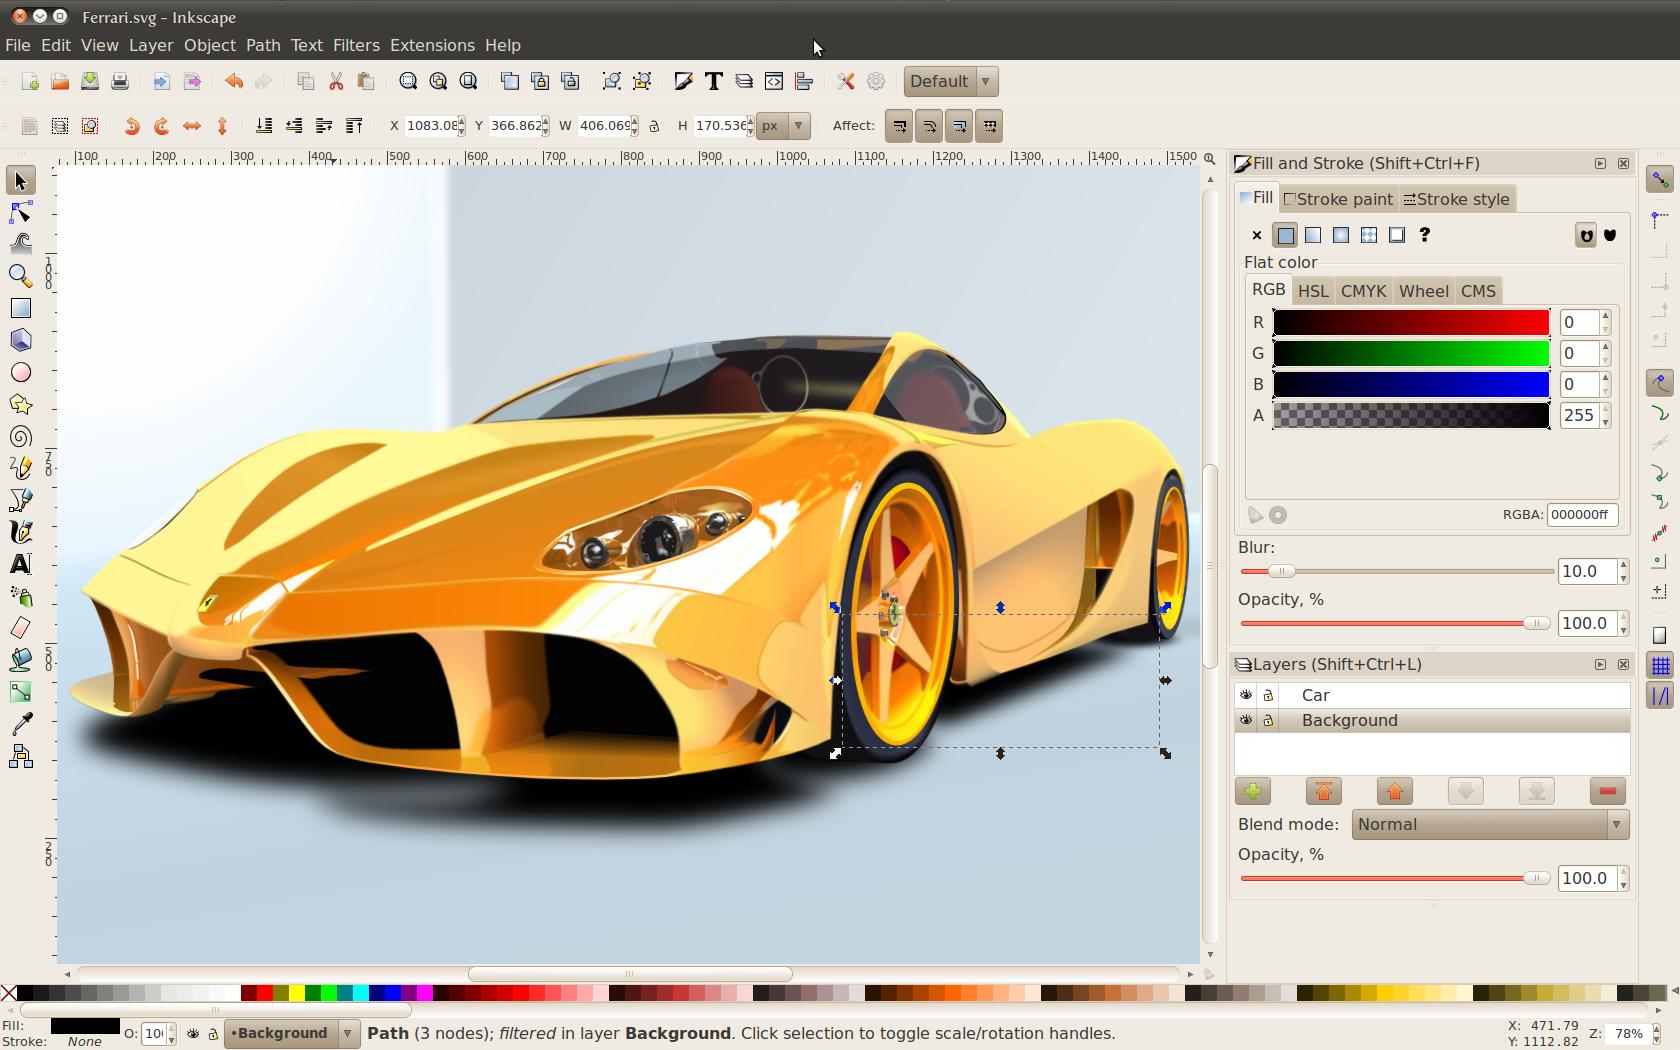 Inkscape 0.48.4